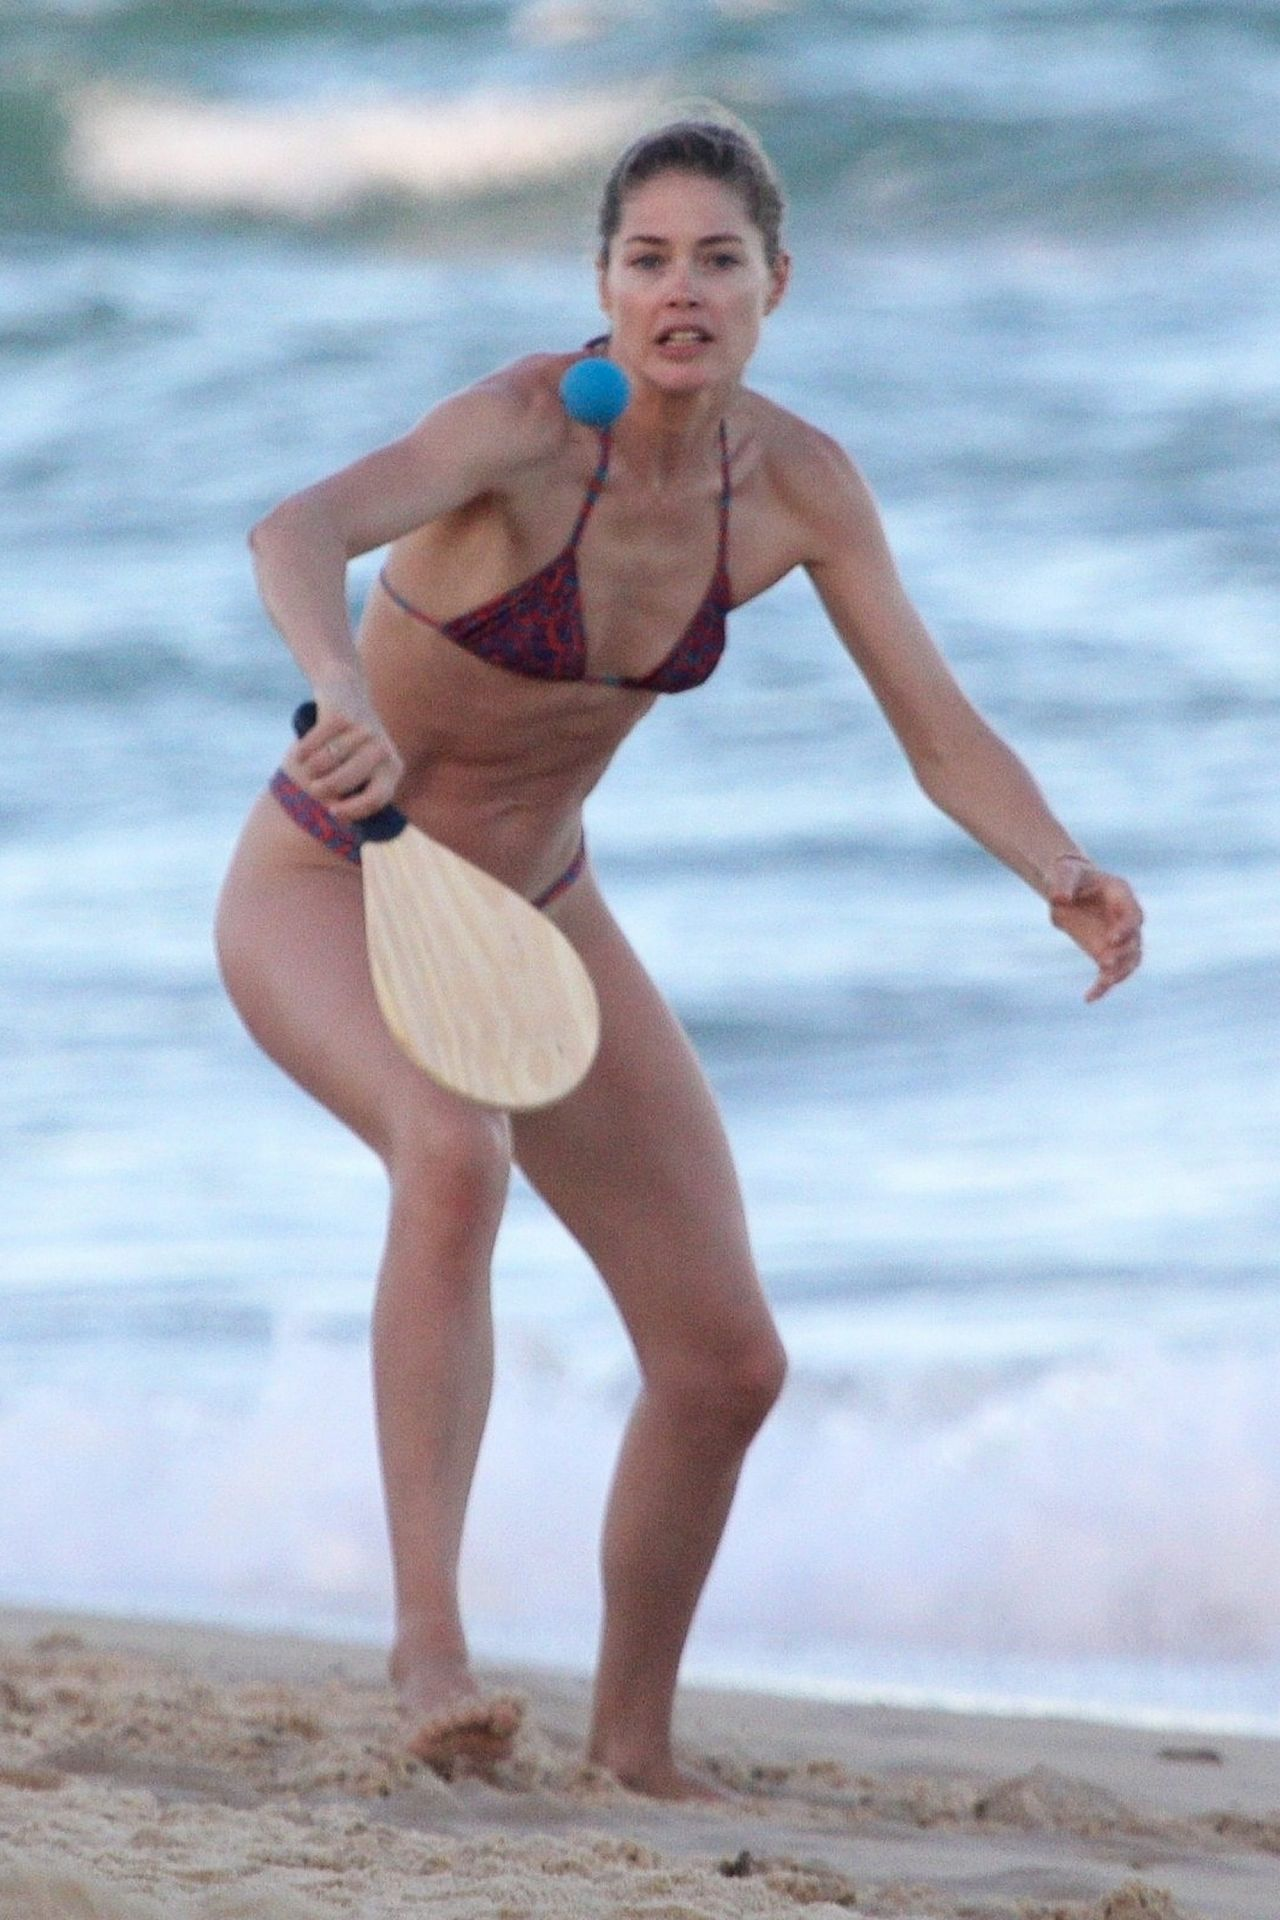 Doutzen Kroes in Bikini in Bahia Pic 10 of 35